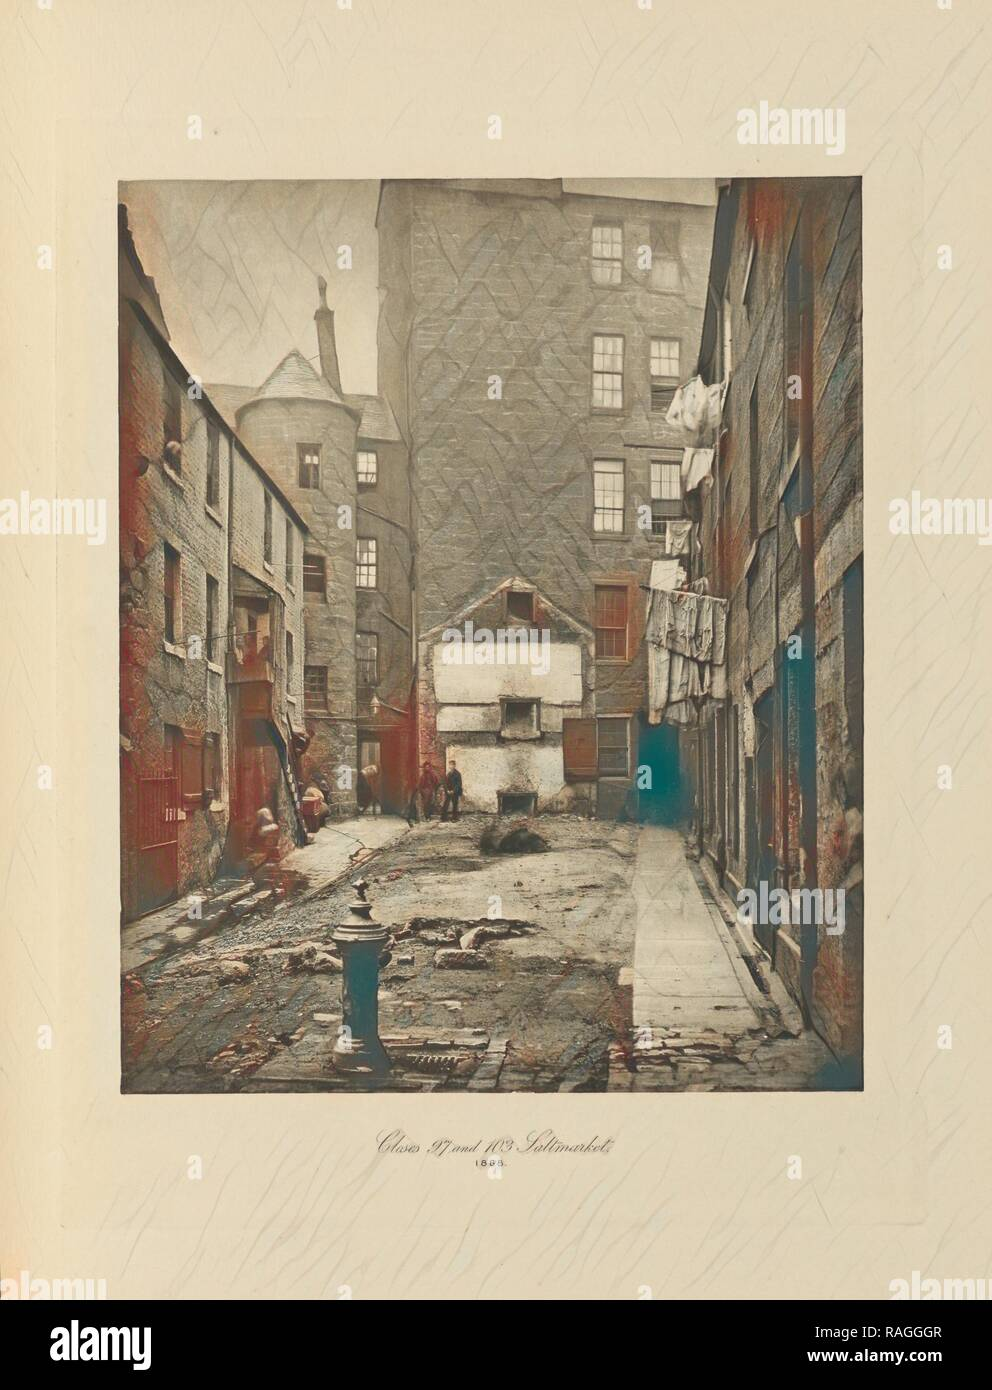 Closes Nos. 97 and 103 Saltmarket, Thomas Annan (Scottish,1829 - 1887), Glasgow, Scotland, negative 1868, print 1900 reimagined - Stock Image